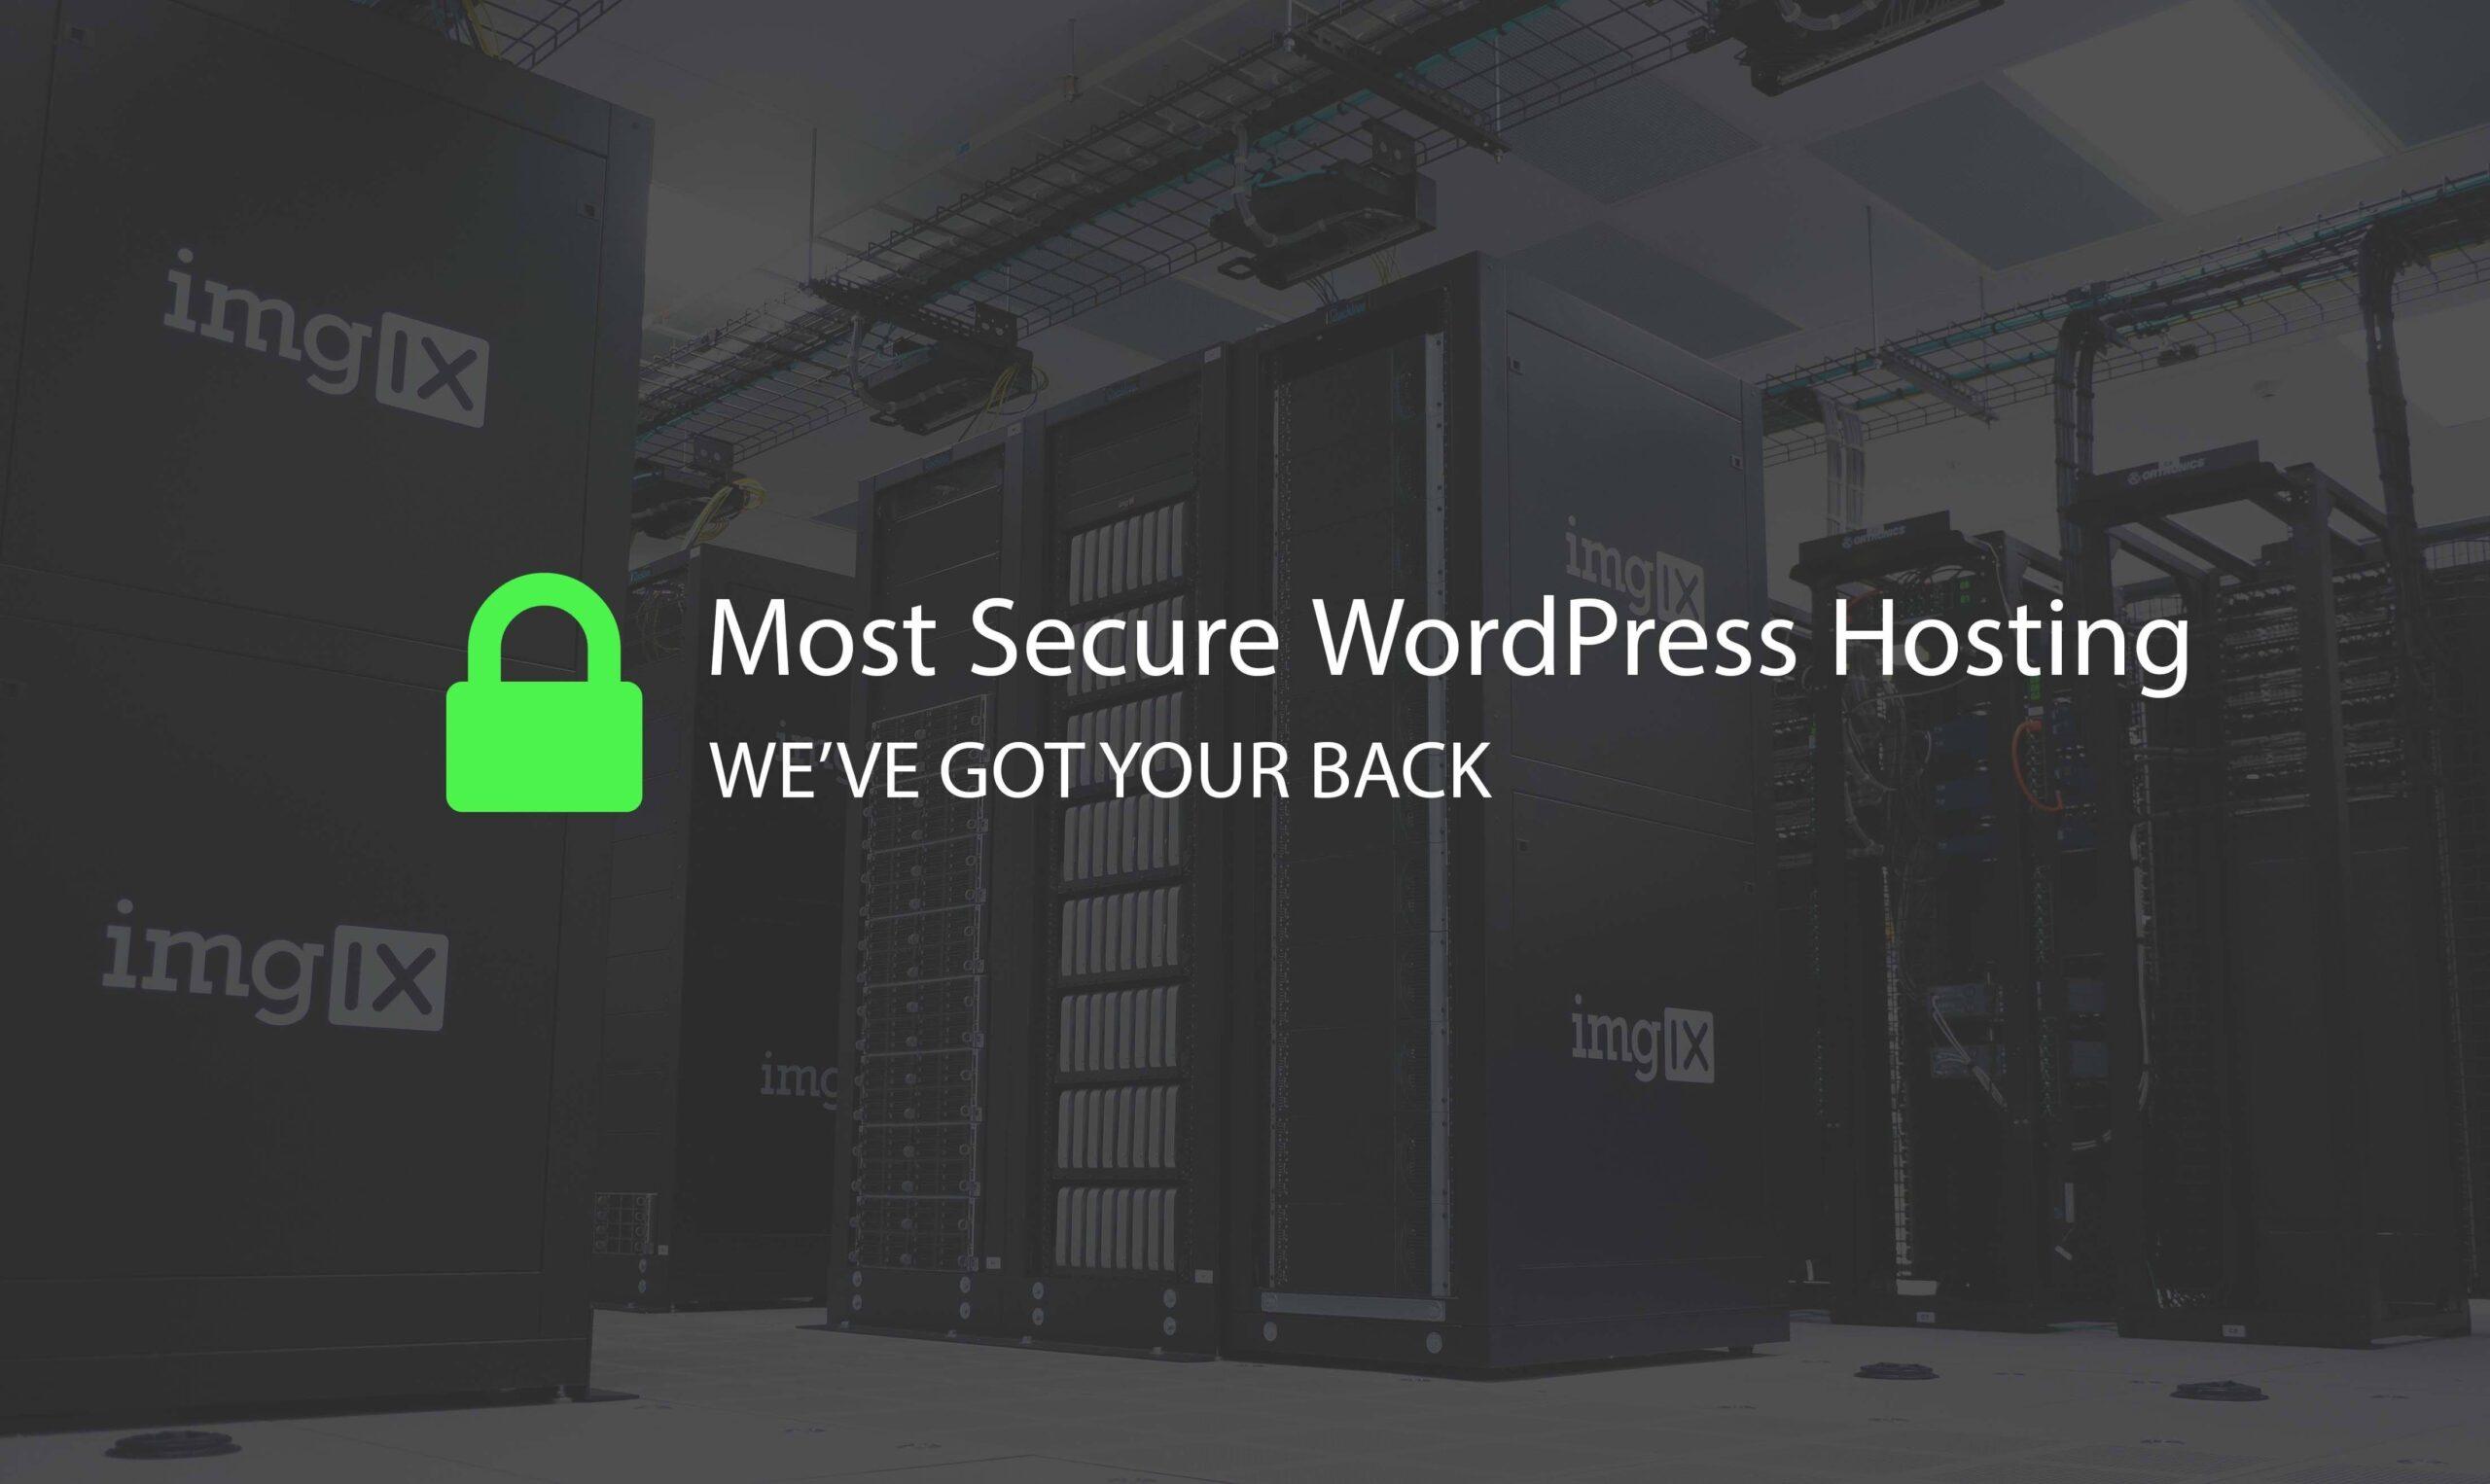 3 Most Secure WordPress Hosting for Business Website